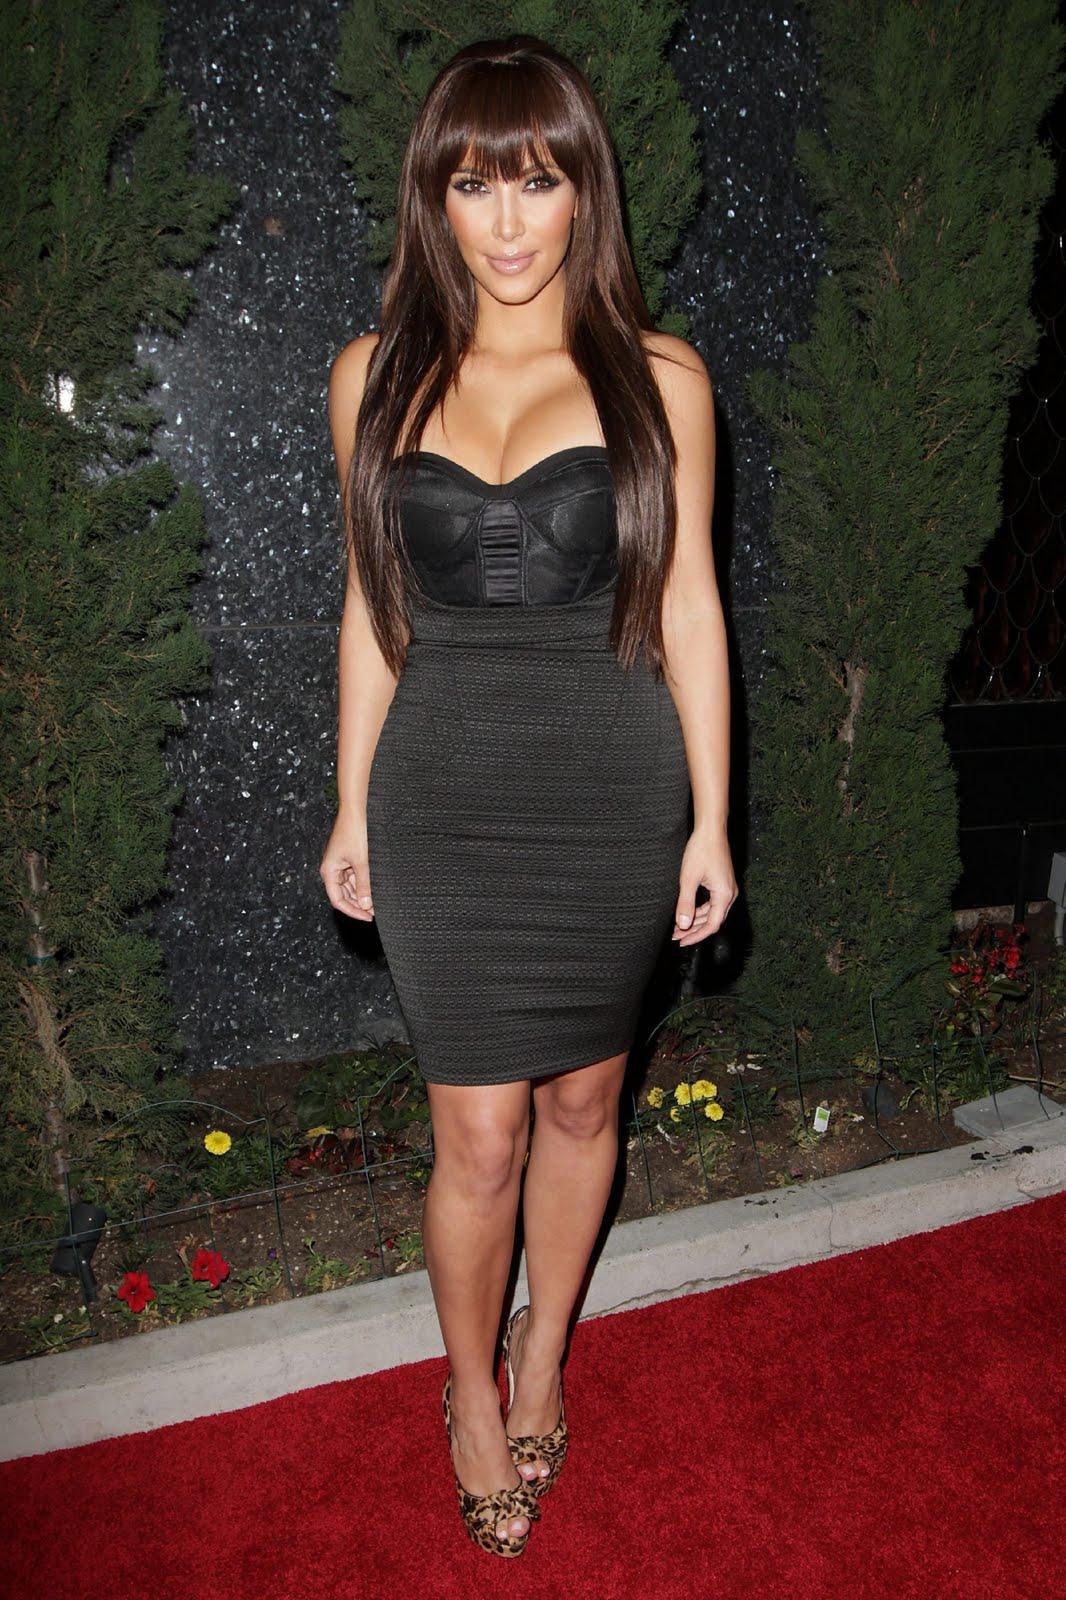 http://3.bp.blogspot.com/_DmEKD5OiTgU/TLPZaGhEyOI/AAAAAAAACkM/LQ6u1Zrfoms/s1600/Kim+Kardashian+03.jpg